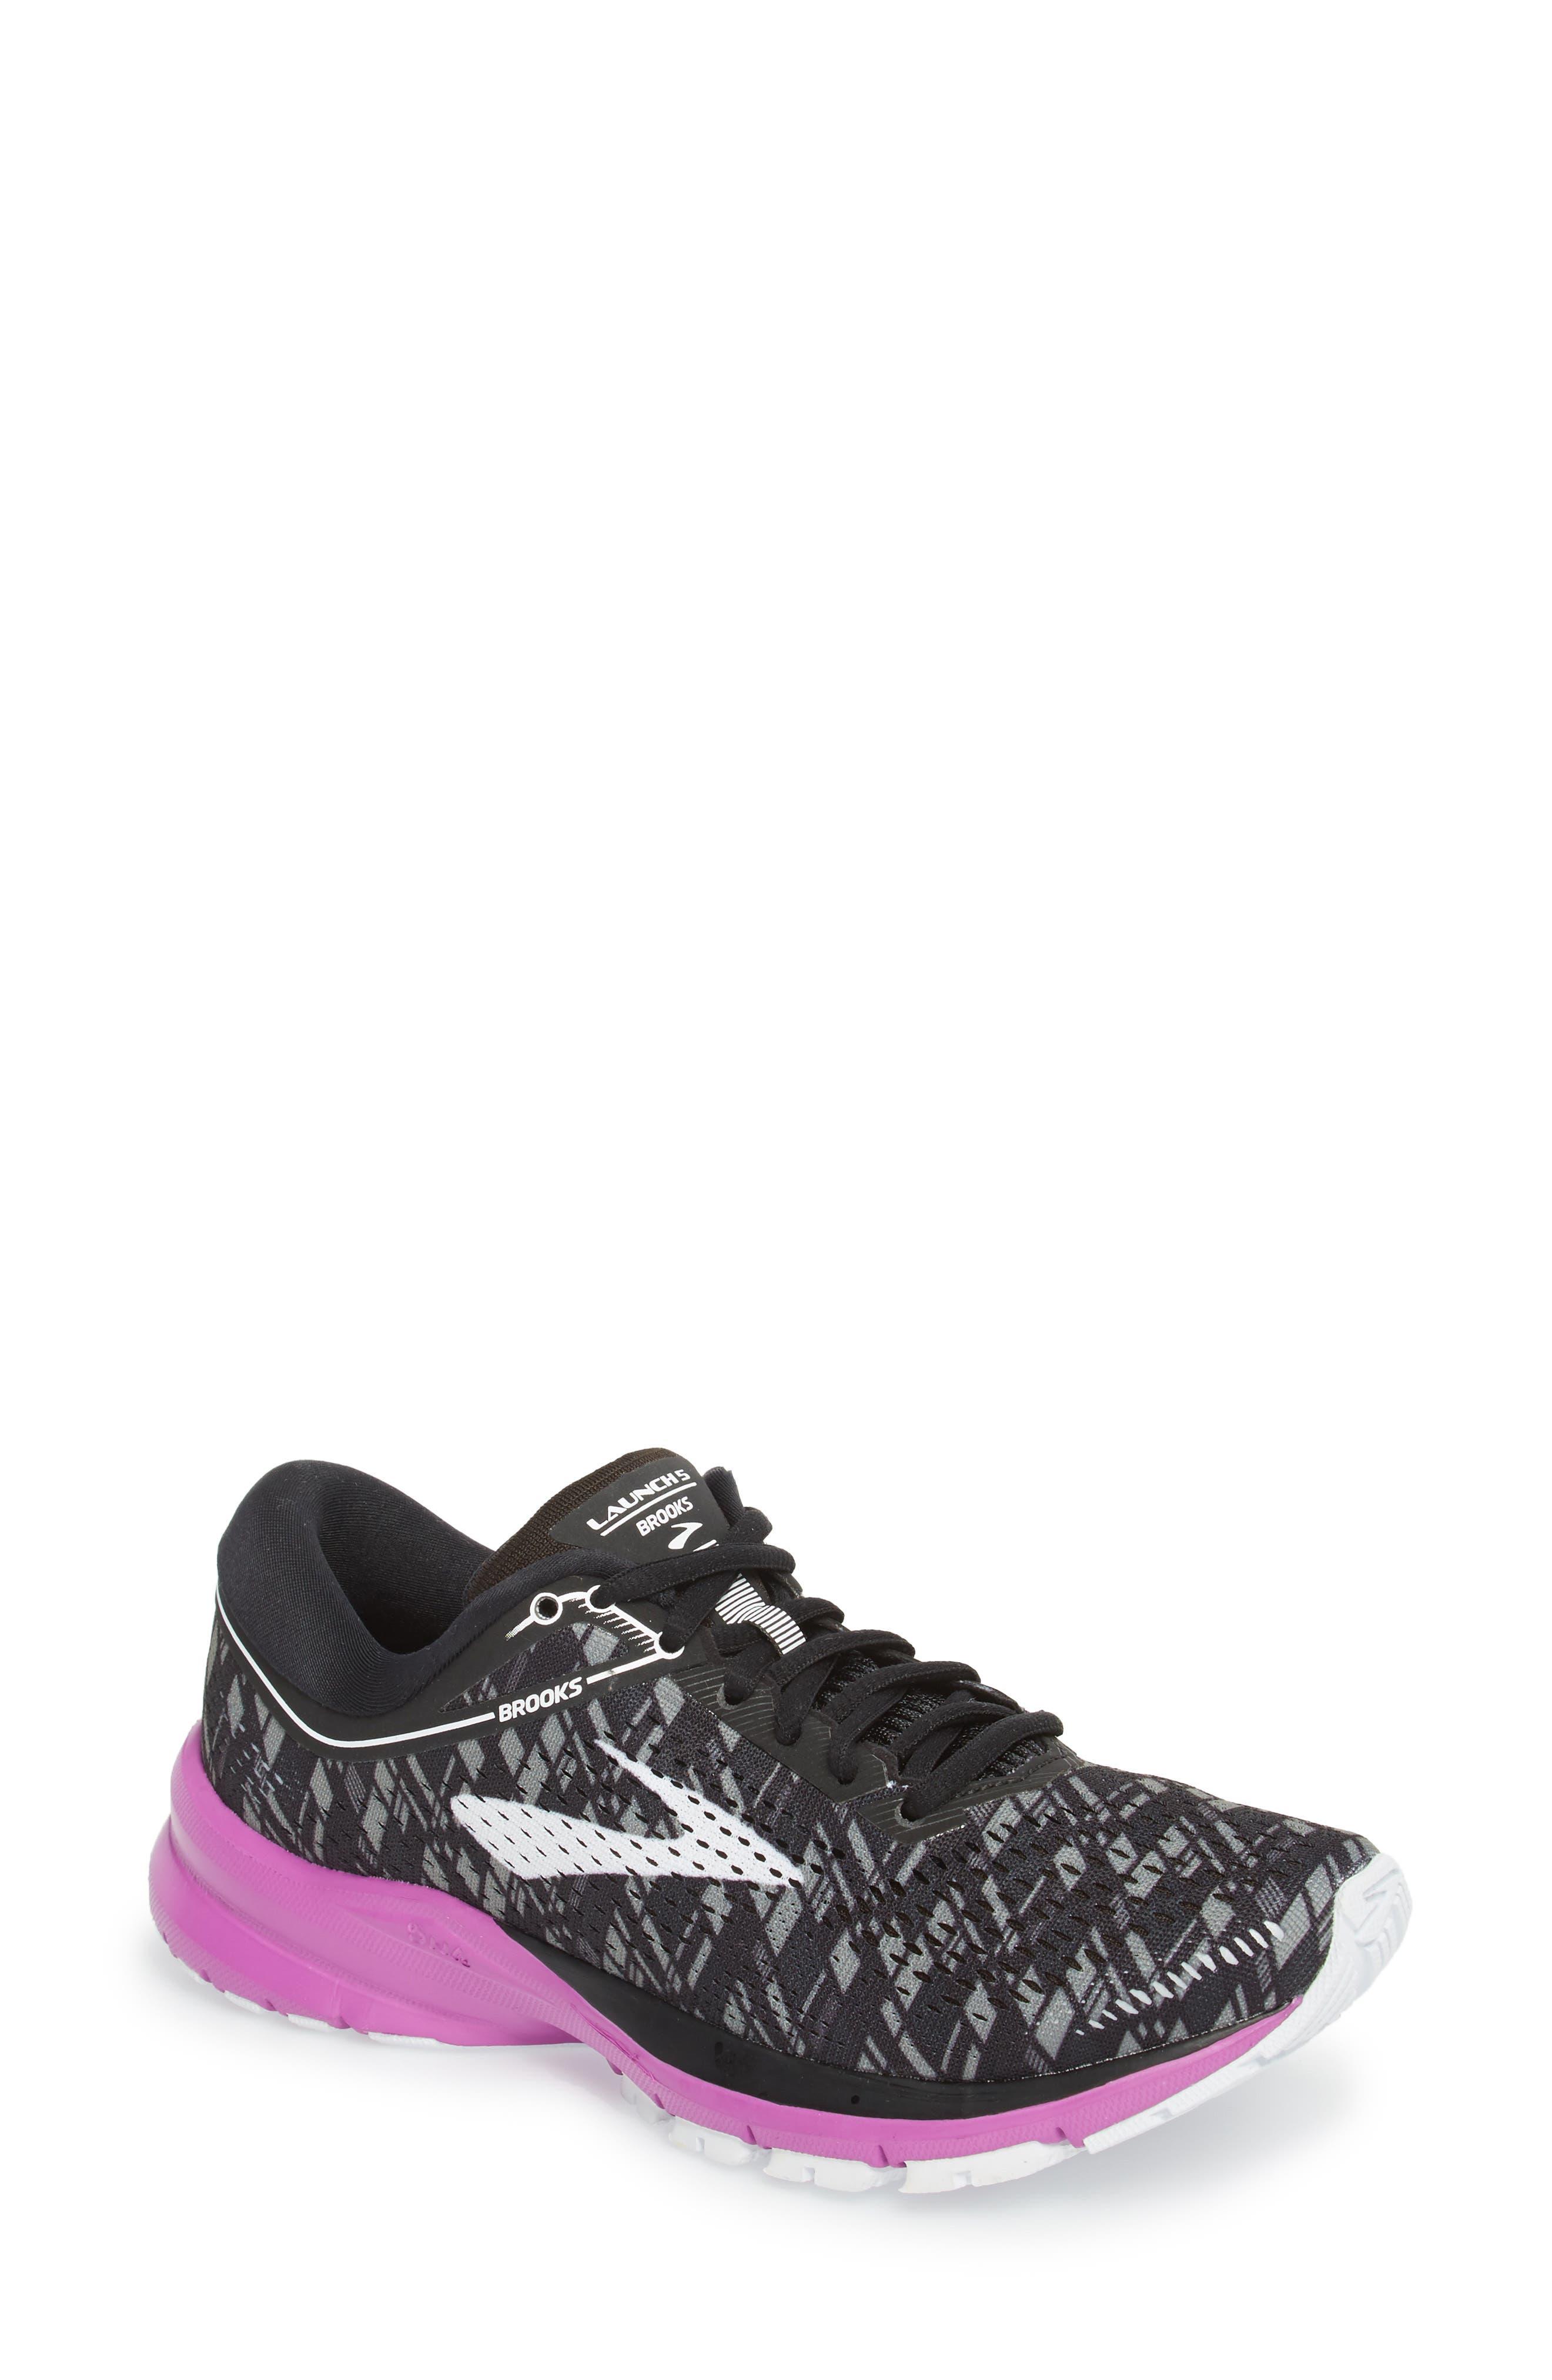 Alternate Image 1 Selected - Brooks Launch 5 Running Shoe (Women)